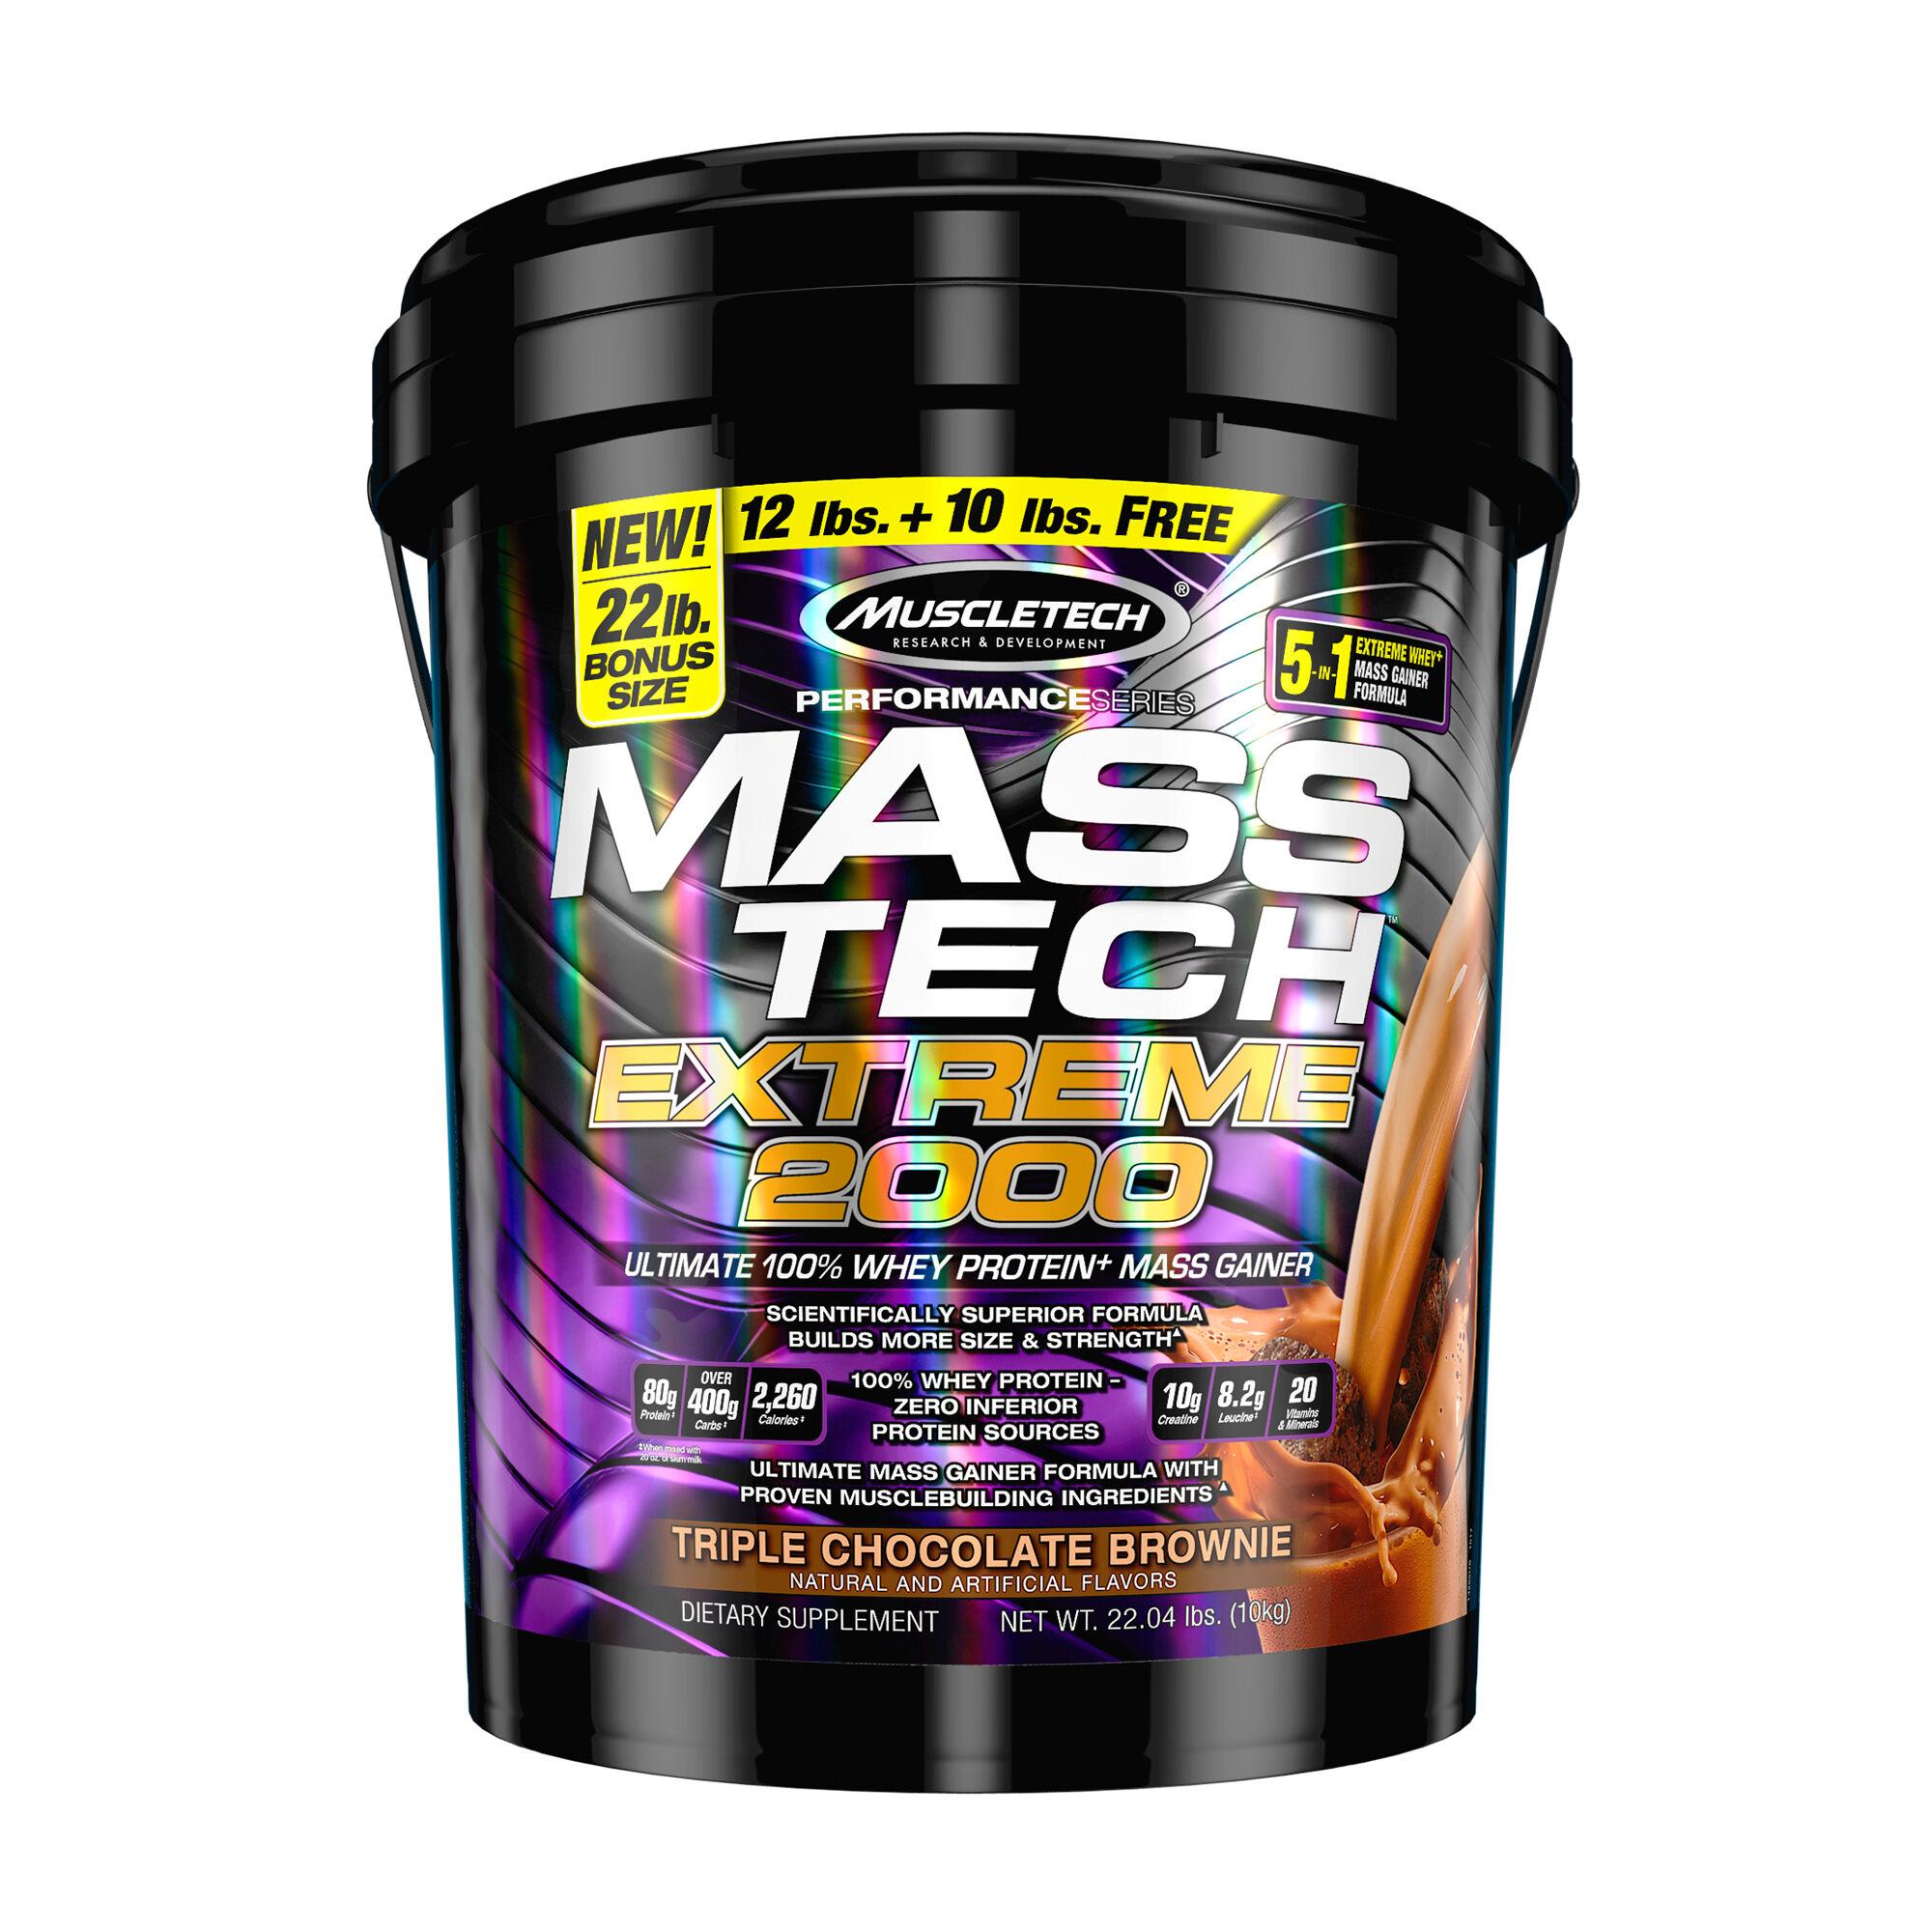 MuscleTech® Mass-Tech® Extreme 2000